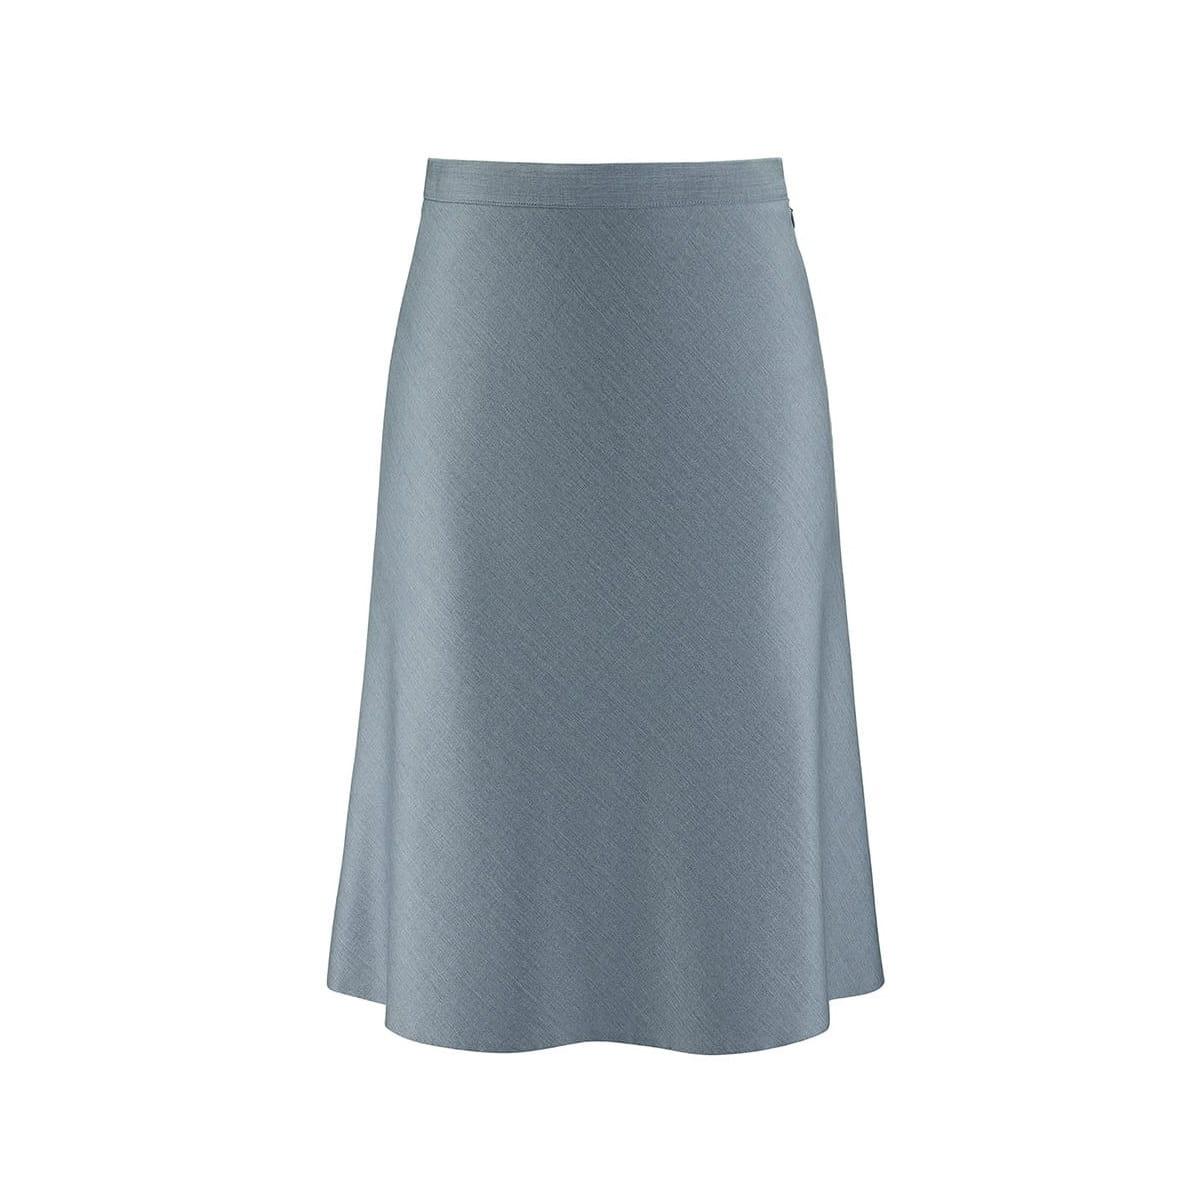 abf98e71 Błękitna spódnica, rozkloszowana